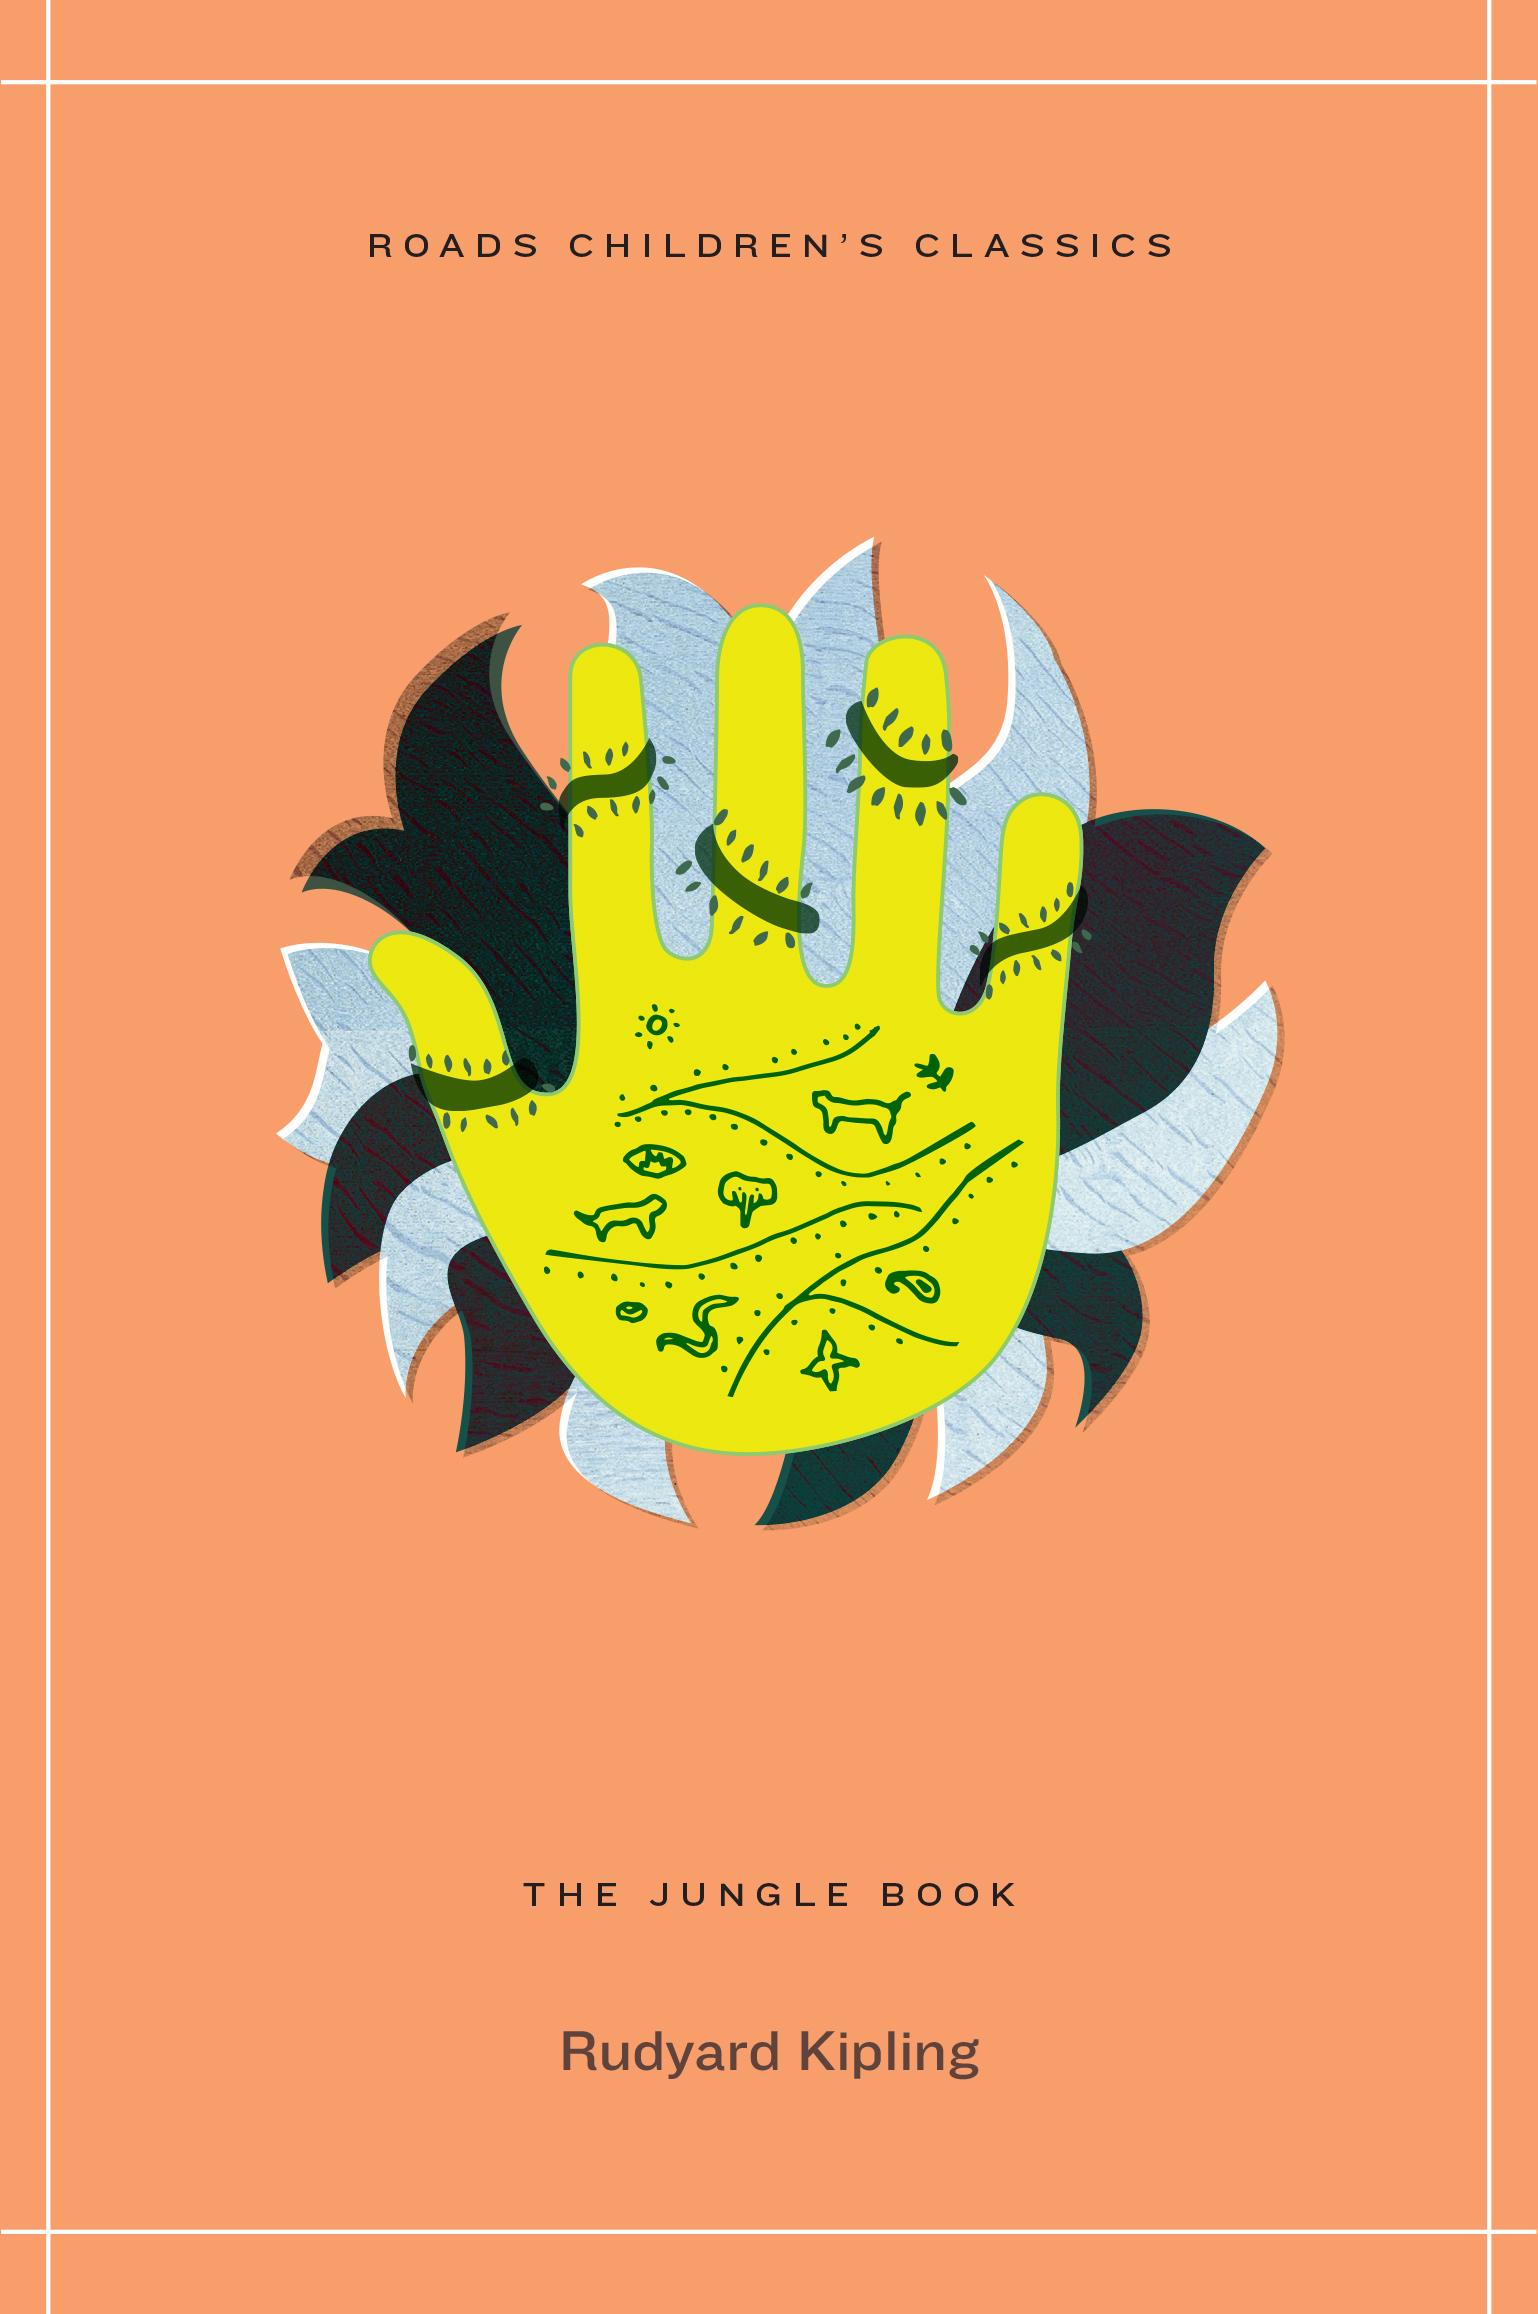 9781909399822 - The Jungle Book.jpg